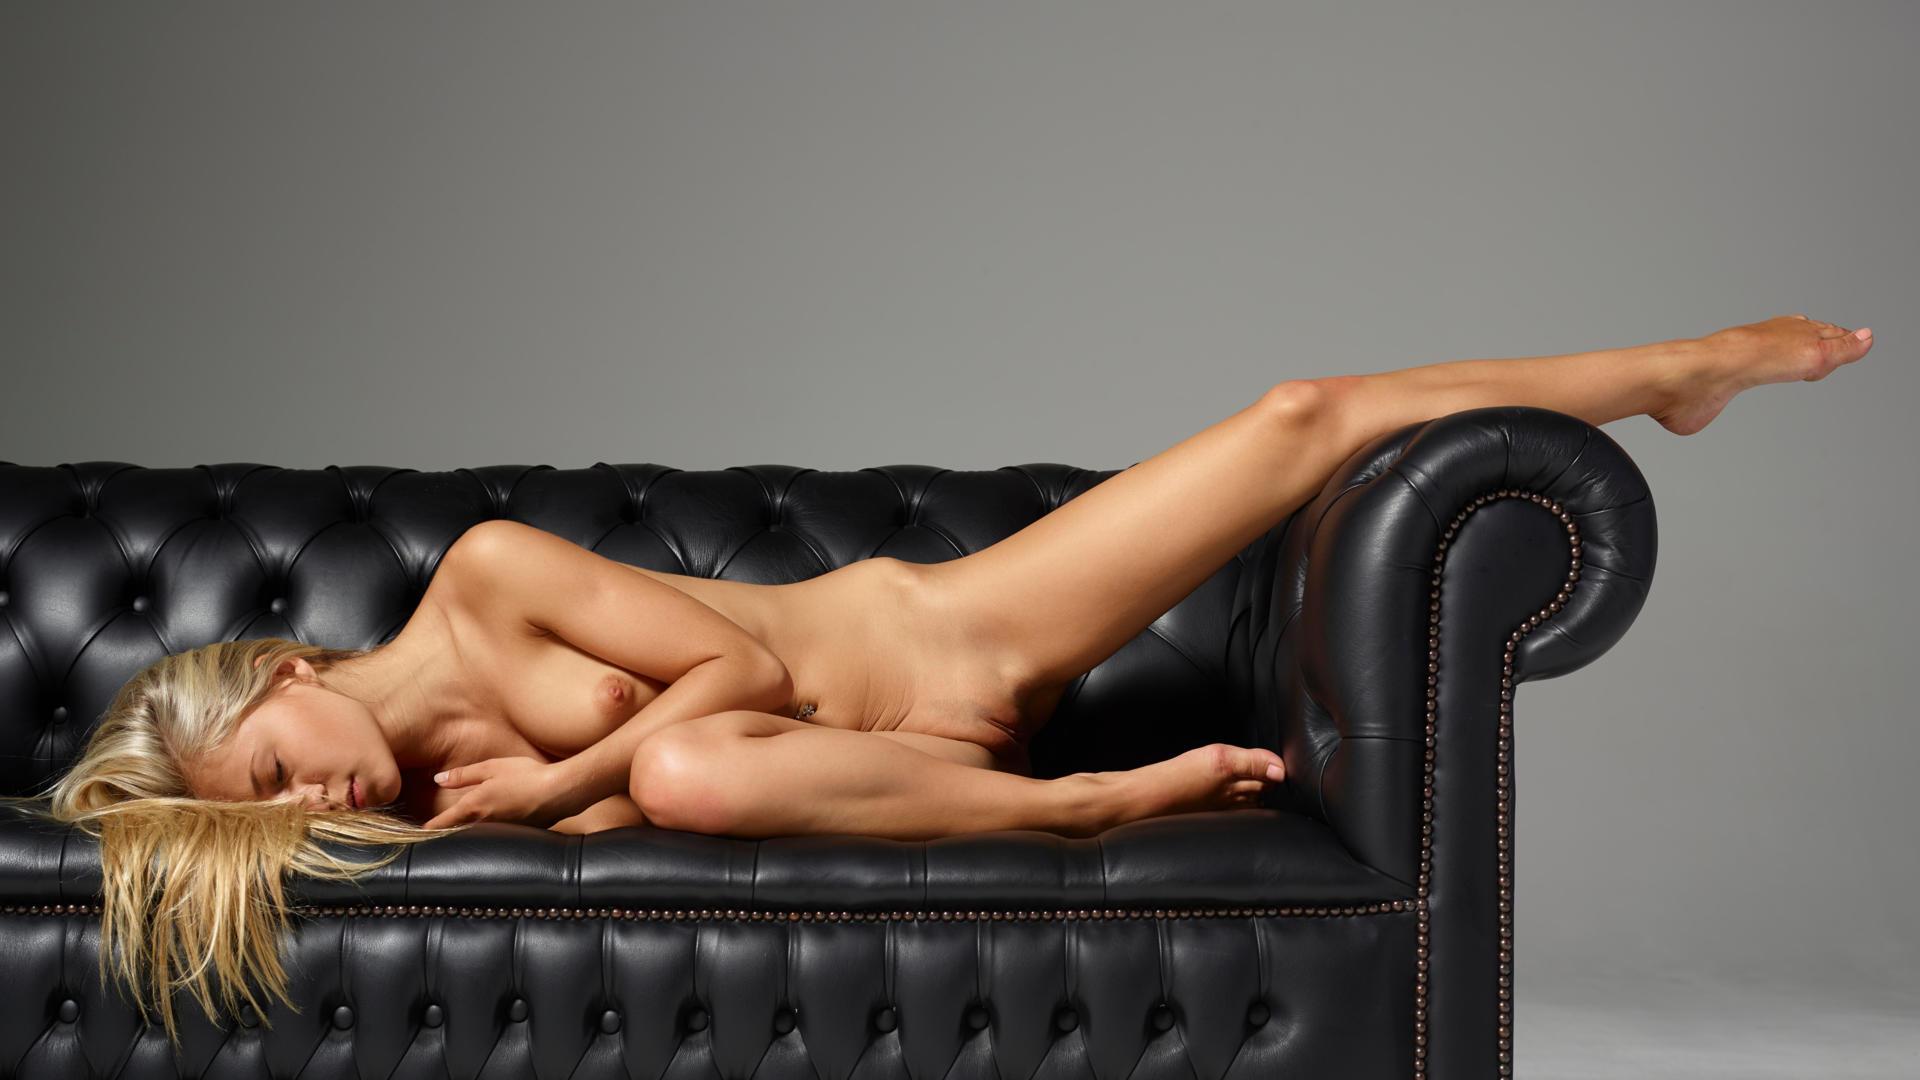 fucking a nude woman